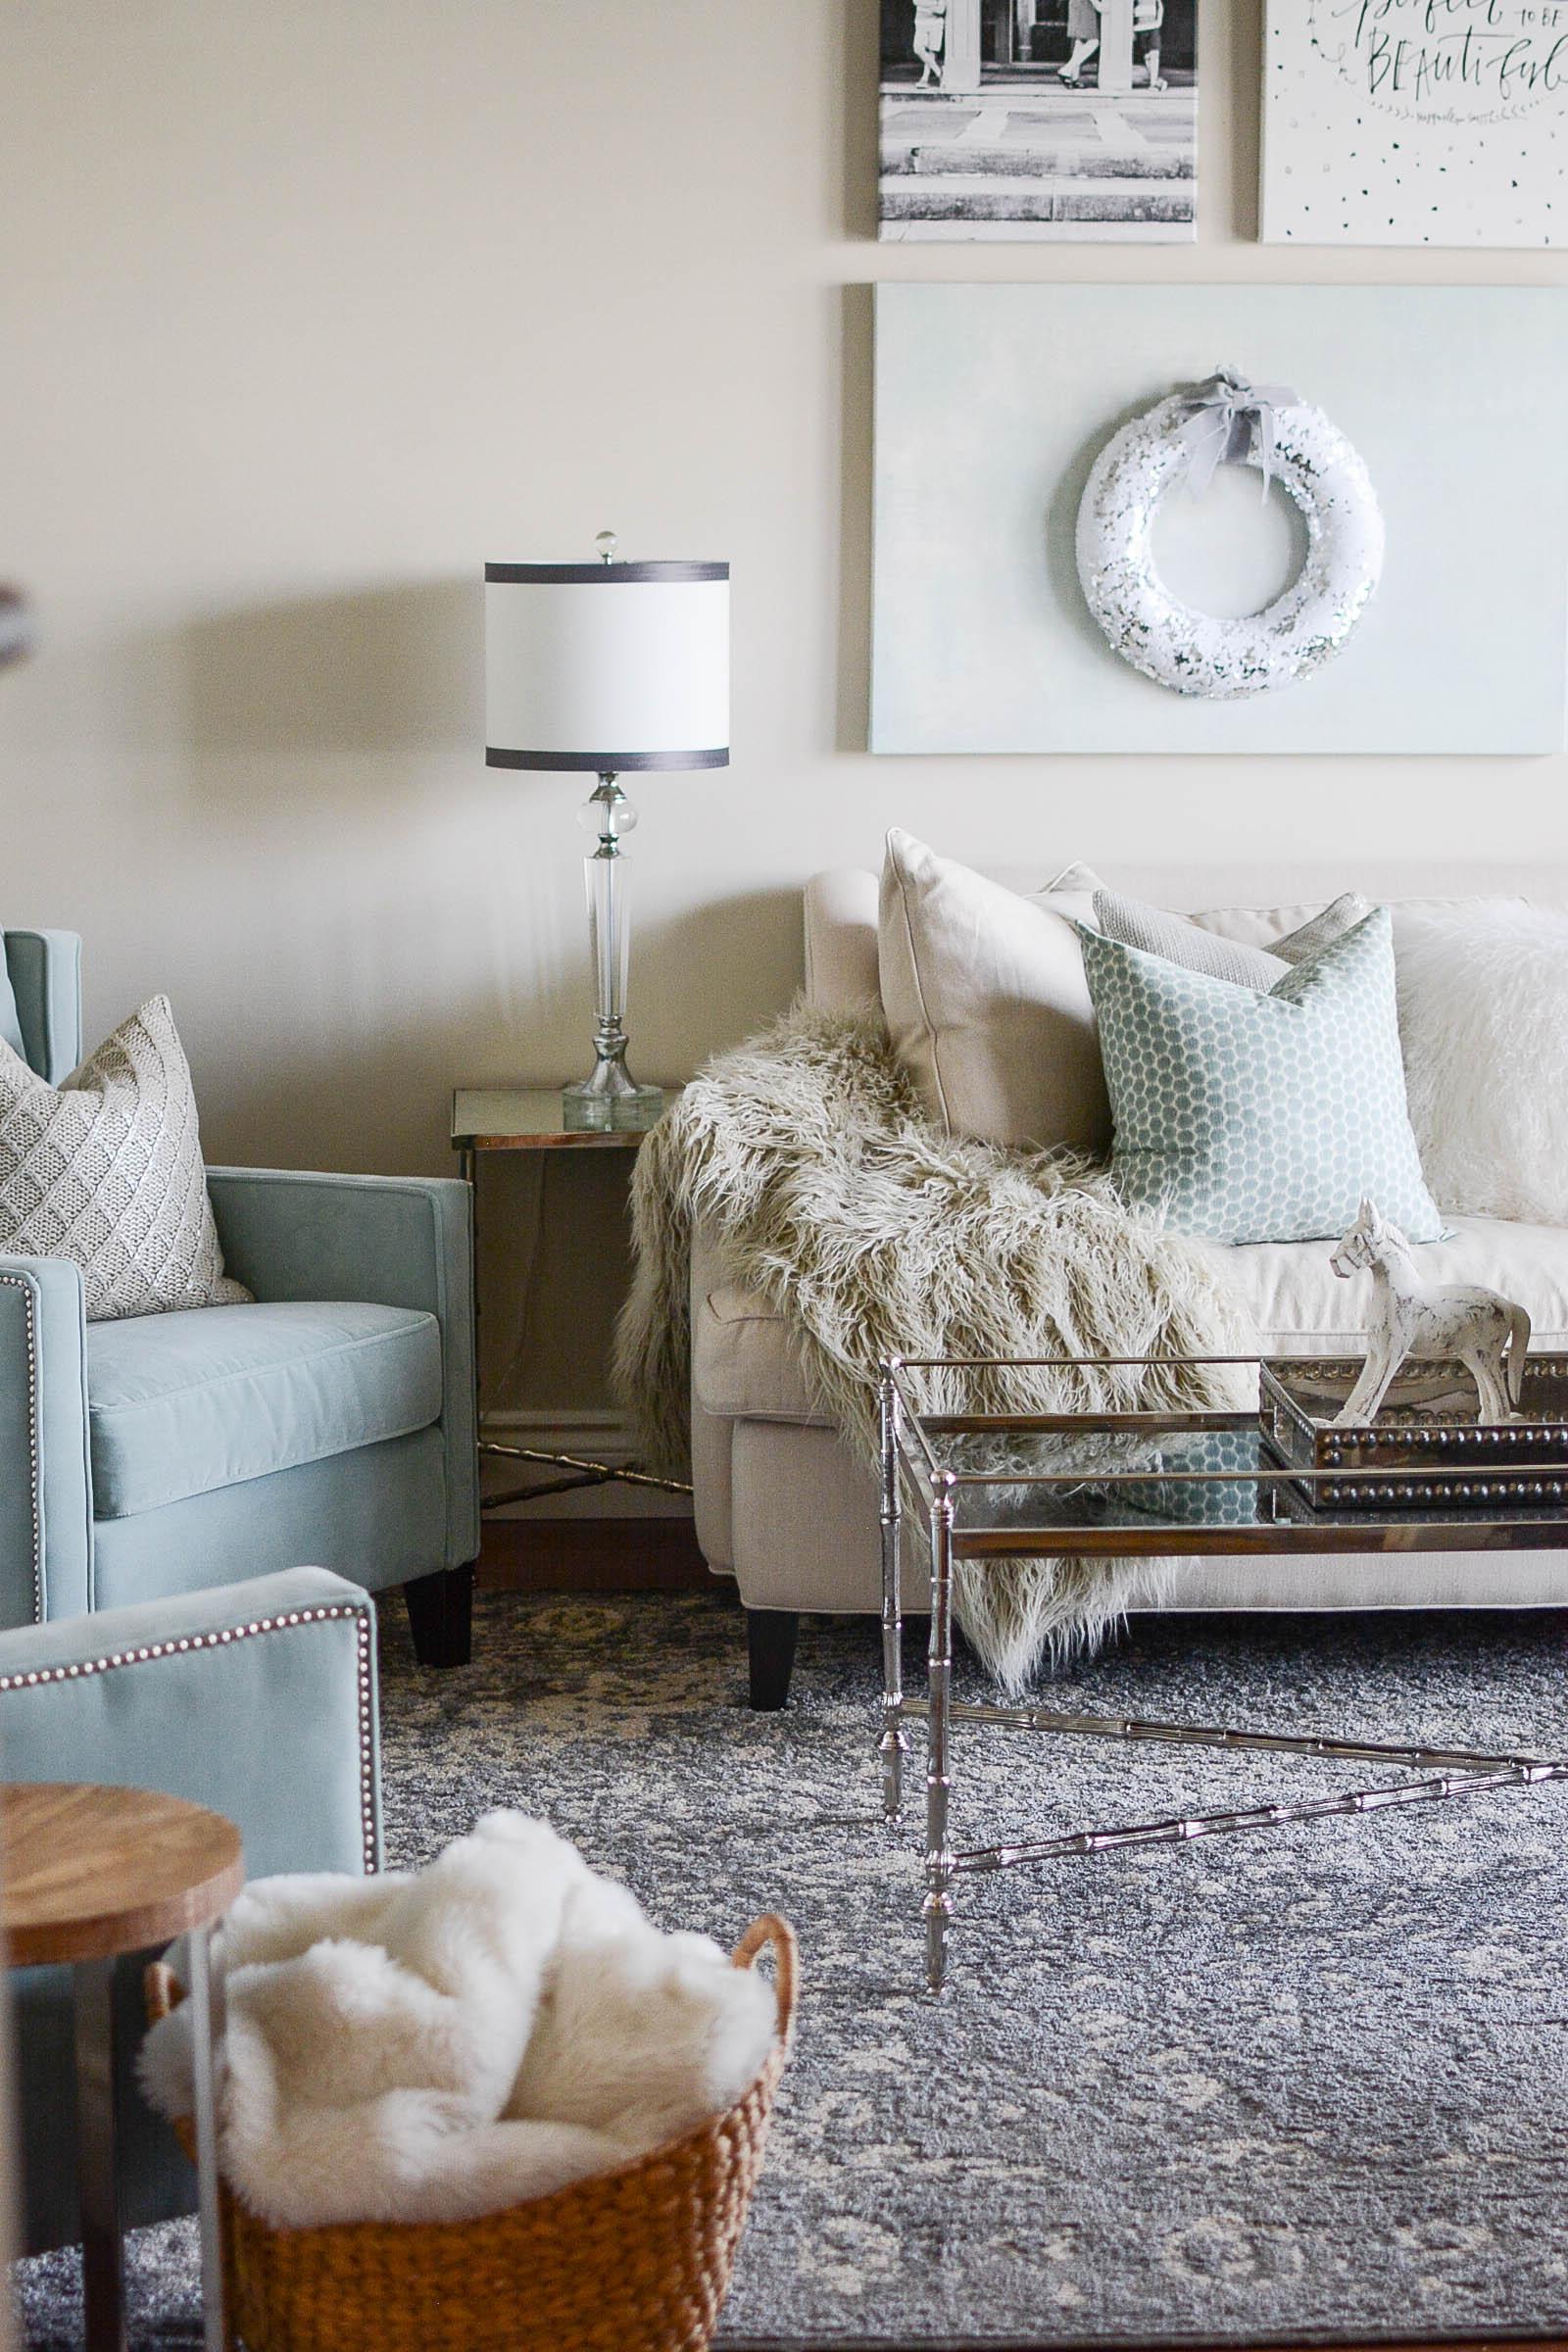 Edgecomb Gray Benjamin Moore living room